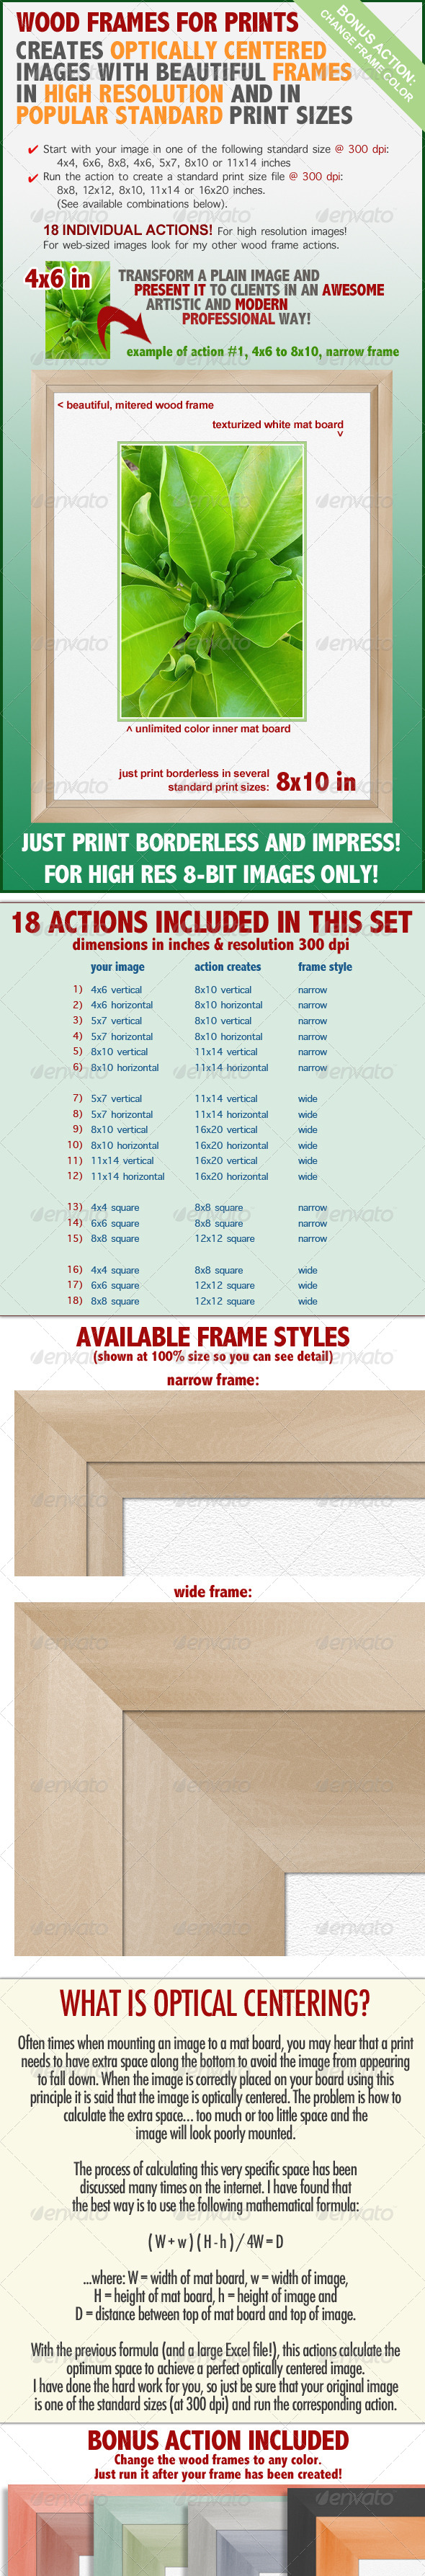 GraphicRiver Wood Frame for Prints Action Set 7031829